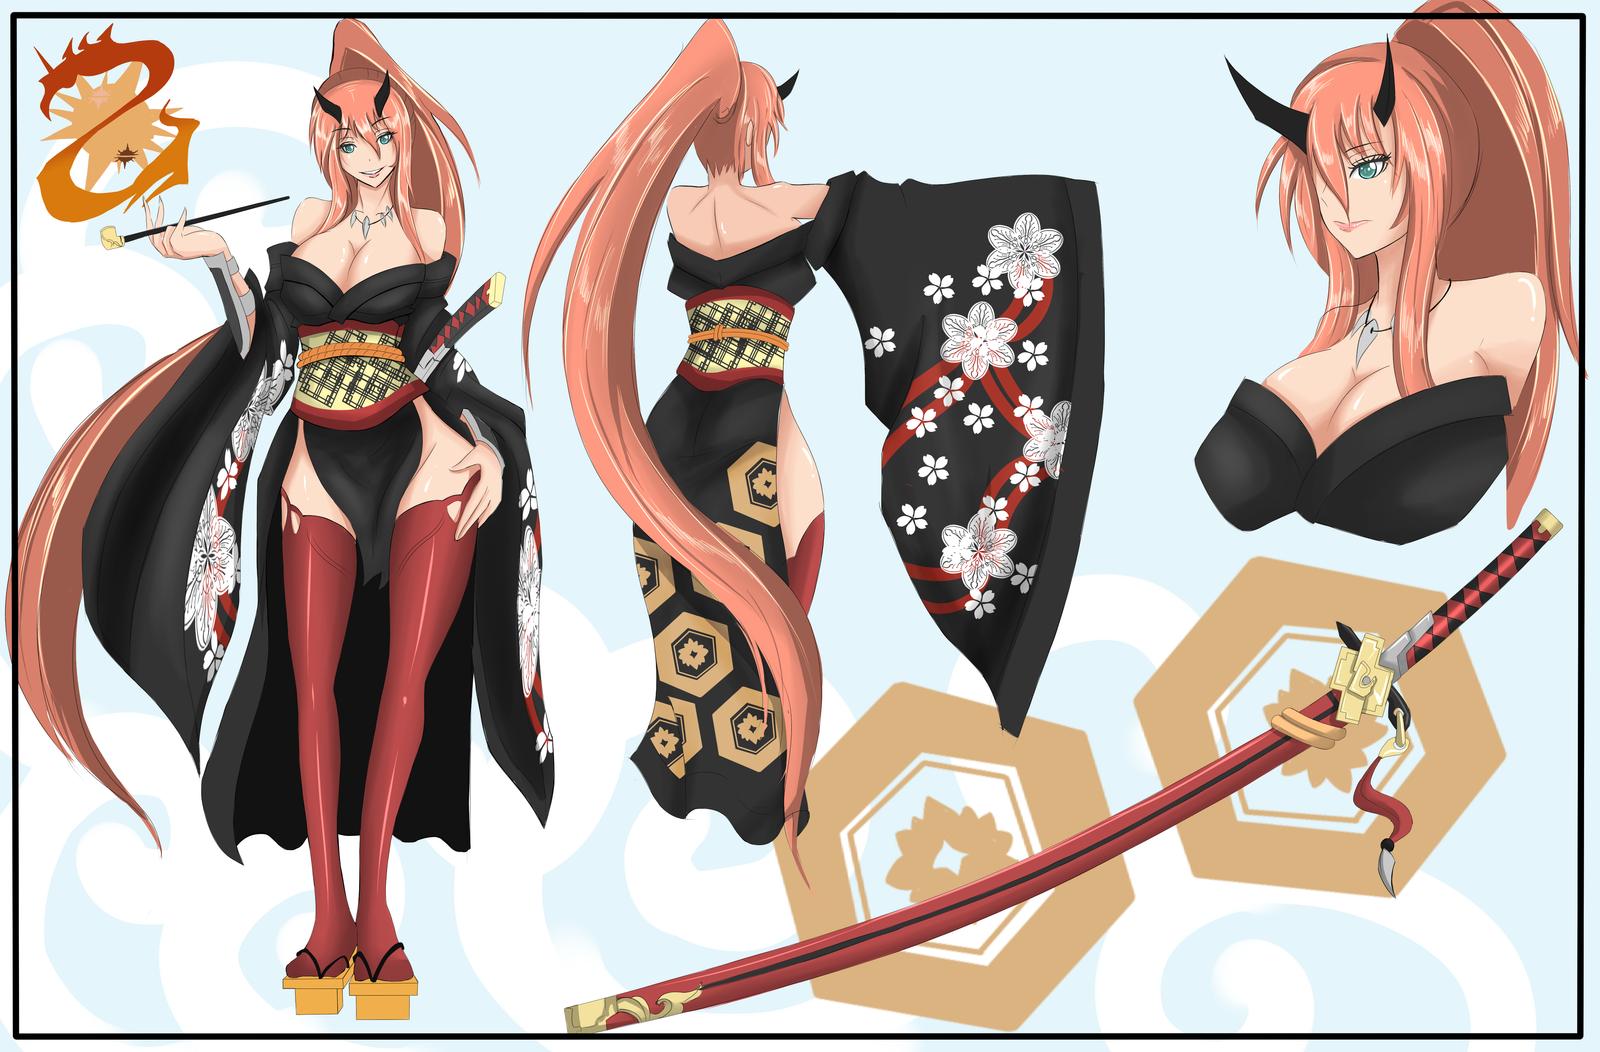 Character Design Oc : Design oc character by torahimemax on deviantart